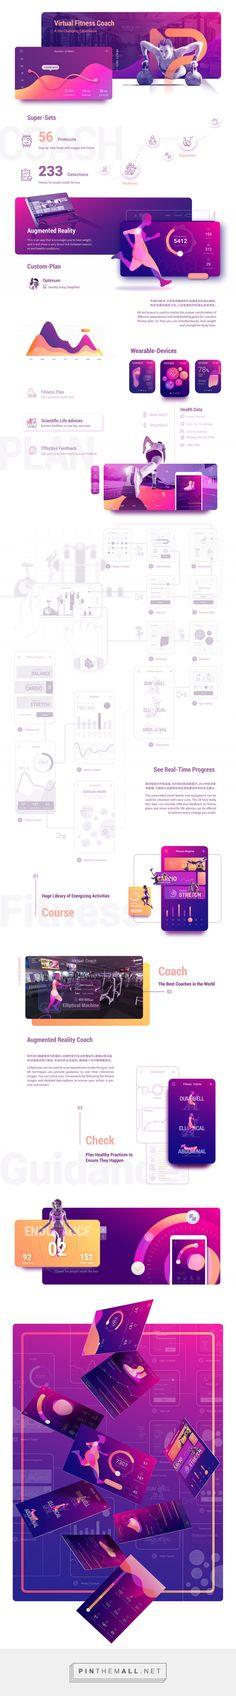 AR Virtual Fitness Coach App | AR 虚拟健身教练 on Behance - created via https://pinthemall.net